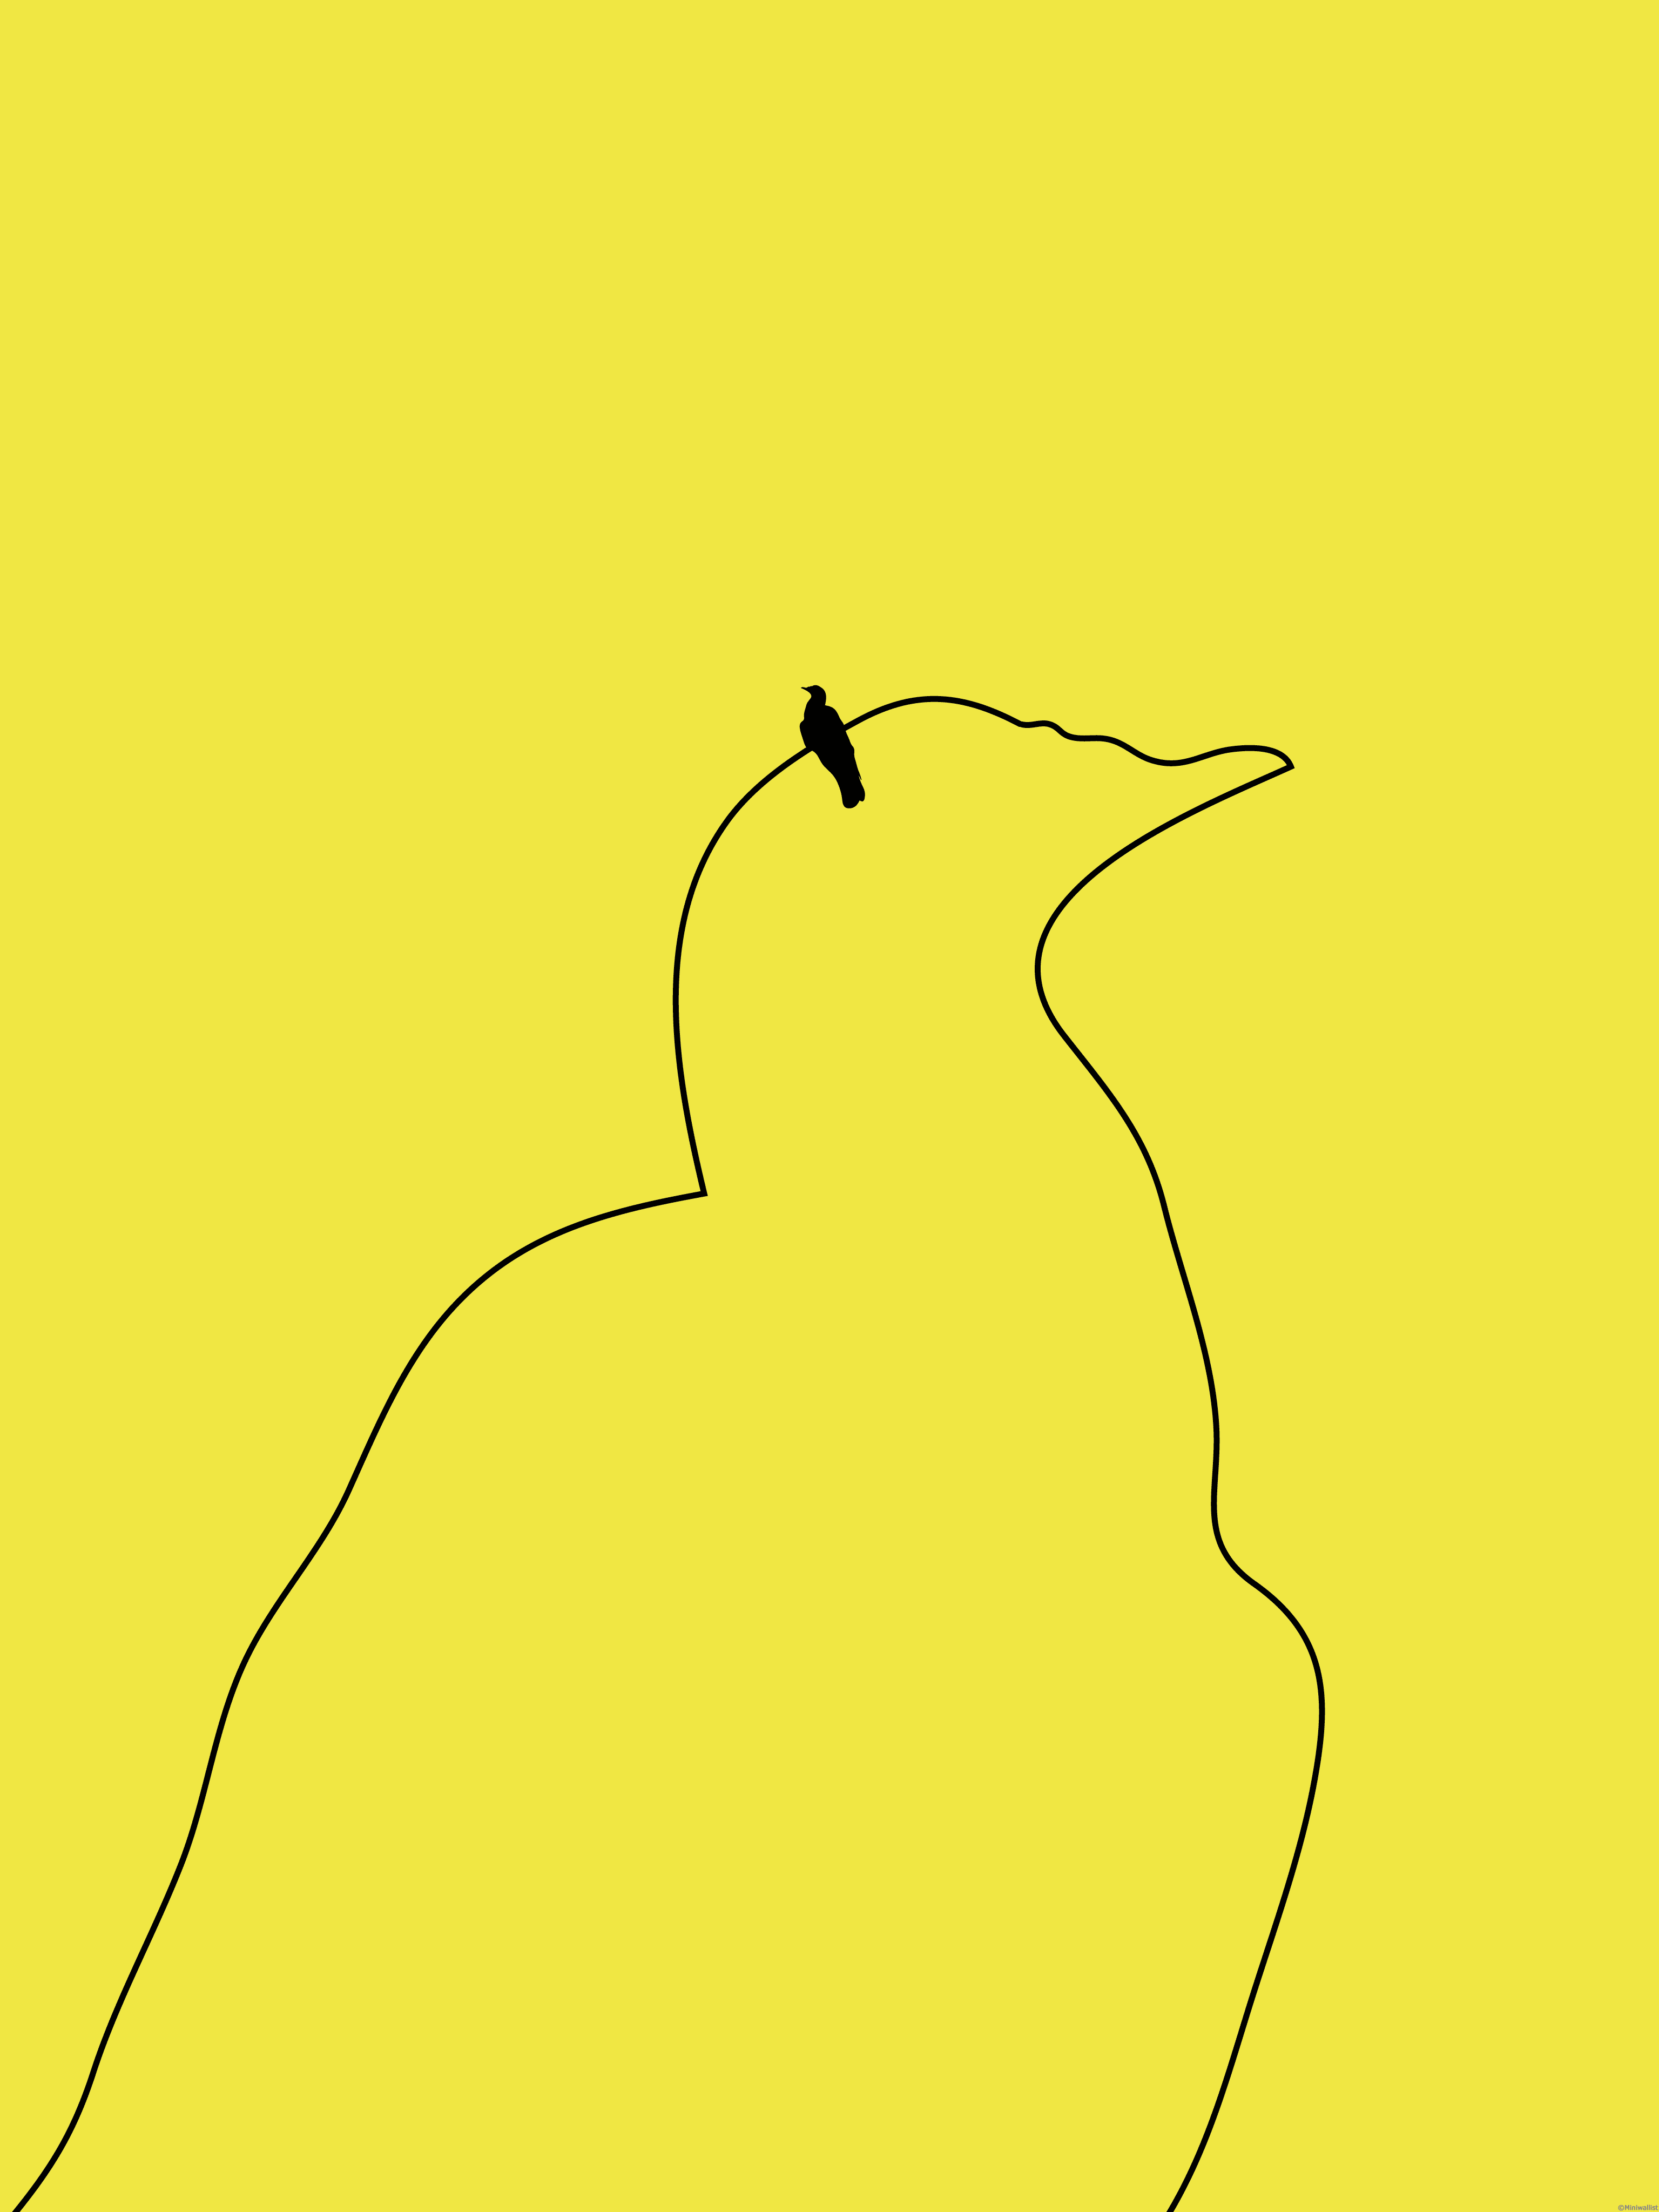 Fantastic Wallpaper Bird Minimalist - bird-on-a-wire-mobile-wallpaper-minimalist-3072x4096  Graphic_1276.png